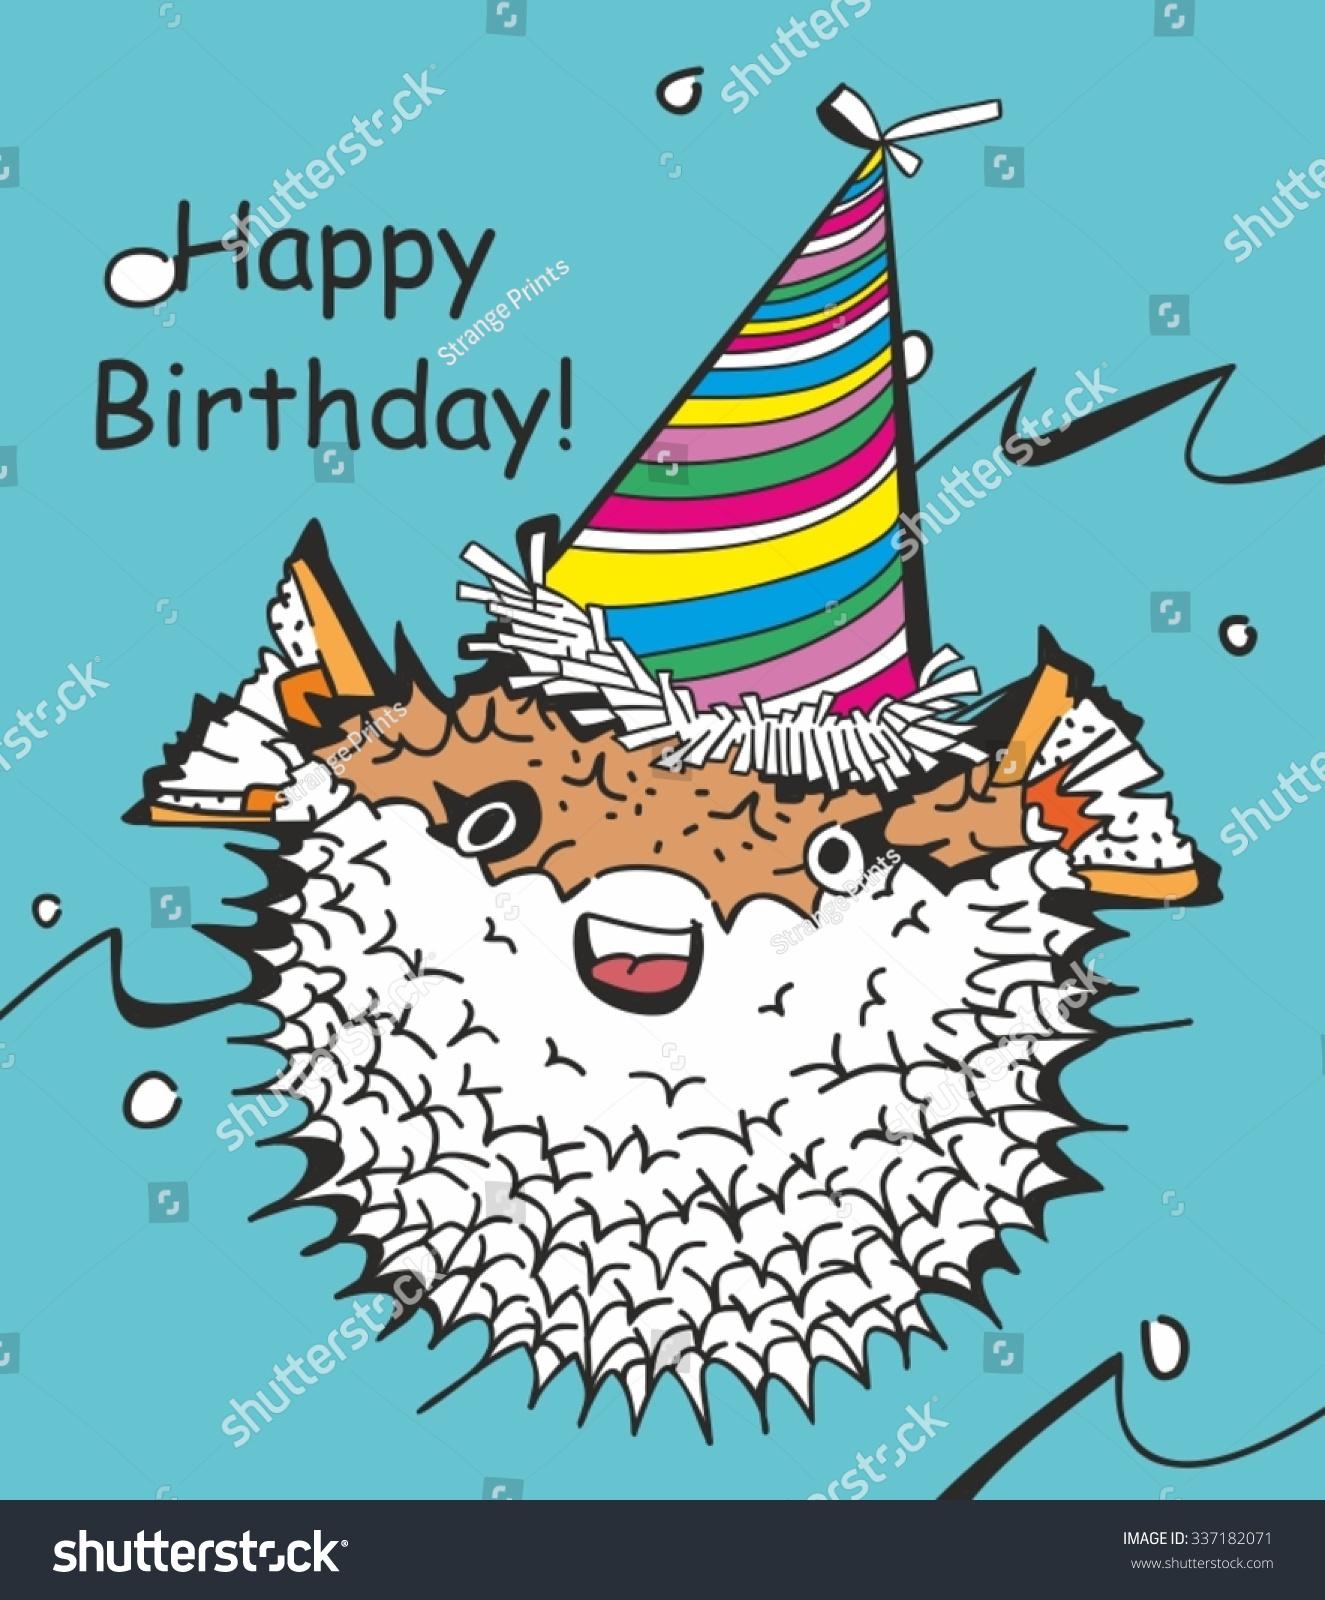 Doge Birthday Card Gallery Free Birthday Cards